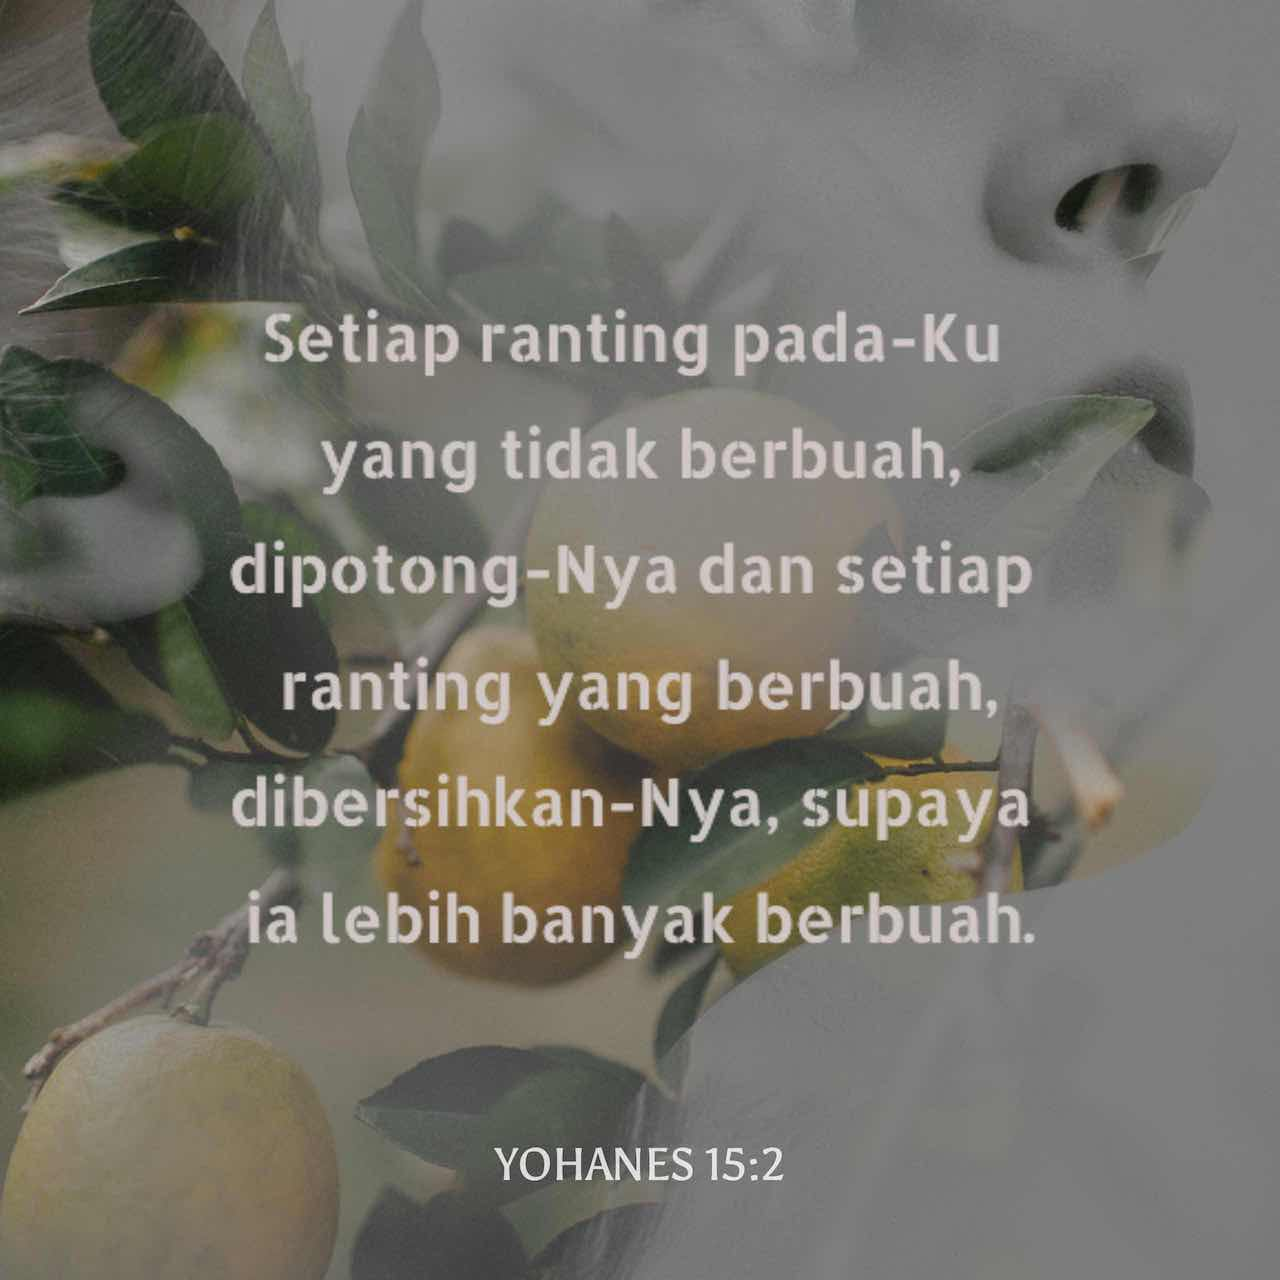 Dia memotong setiap cabang di dalam diri saya yang tidak menghasilkan buah, sedangkan setiap cabang yang menghasilkan buah dipangkas-Nya sehingga akan berbuah lebih banyak. - Yohanes 15:2 - Gambar Ayat